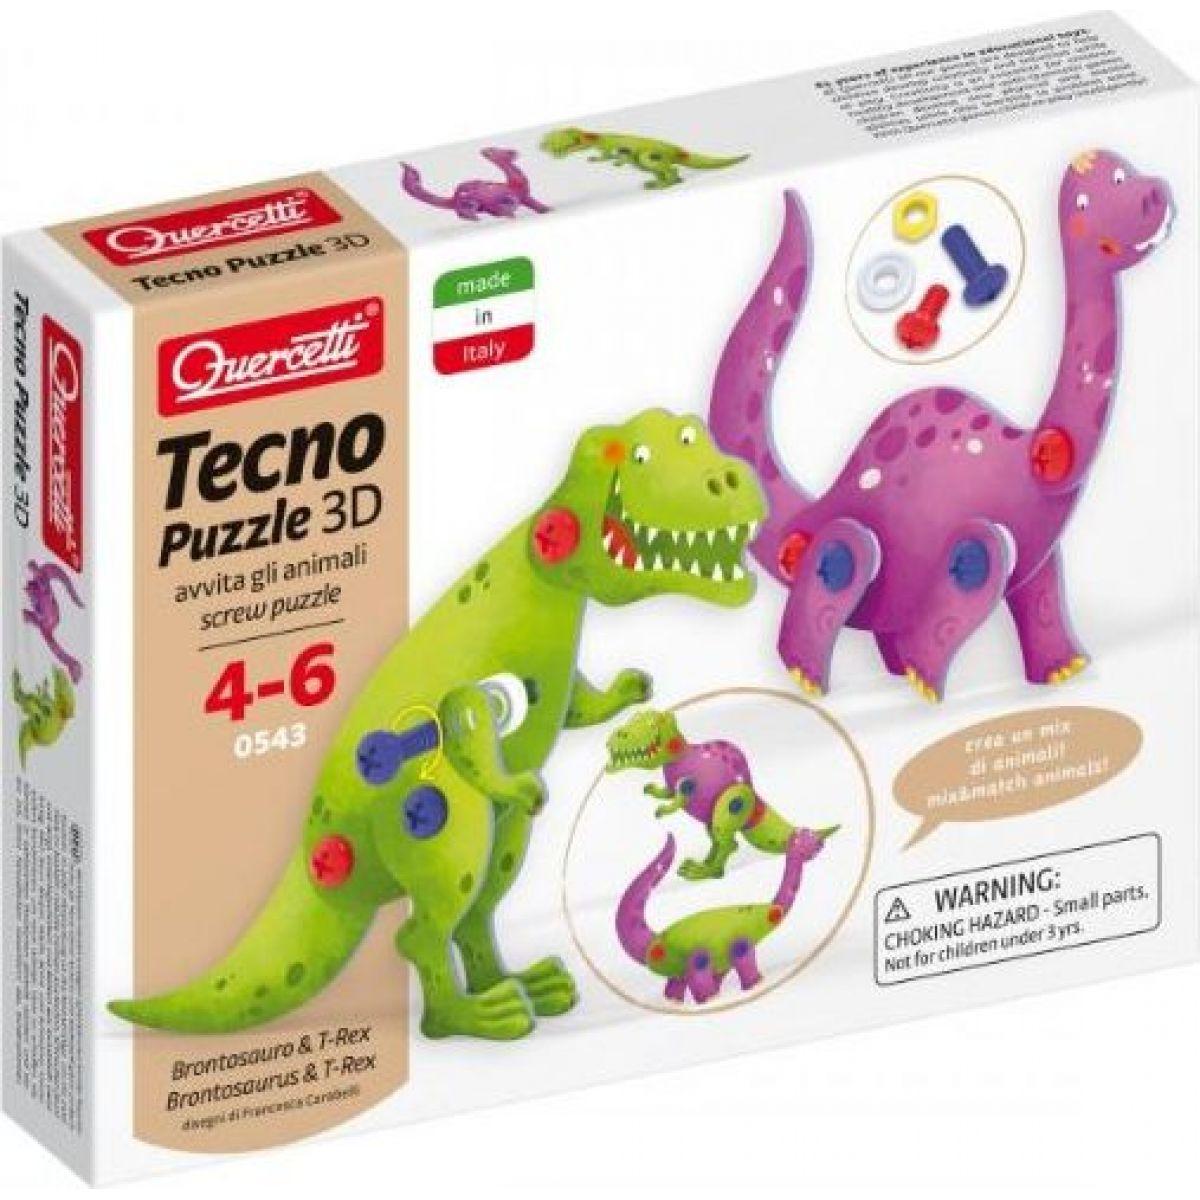 Quercetti Tecno 3D Puzzle brontosaurus a T-Rex